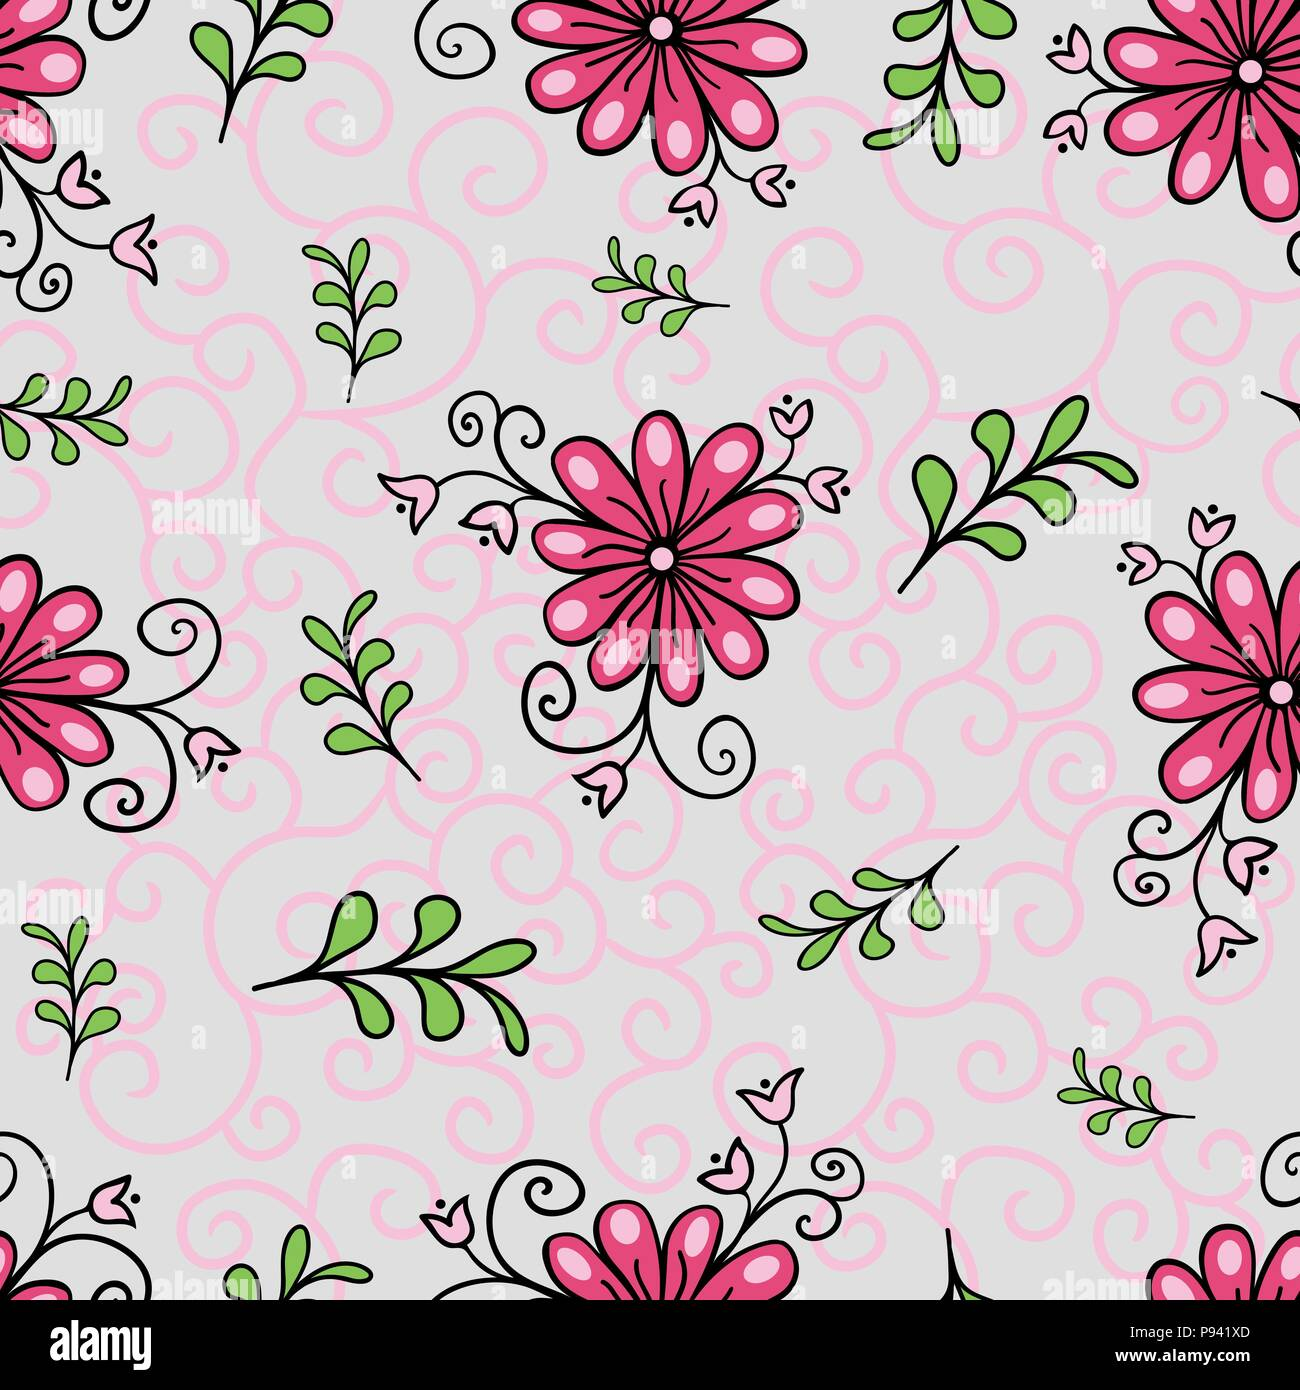 Nahtlose Floralen Muster Moderne Abstrakte Farbenfrohe Stil Hand